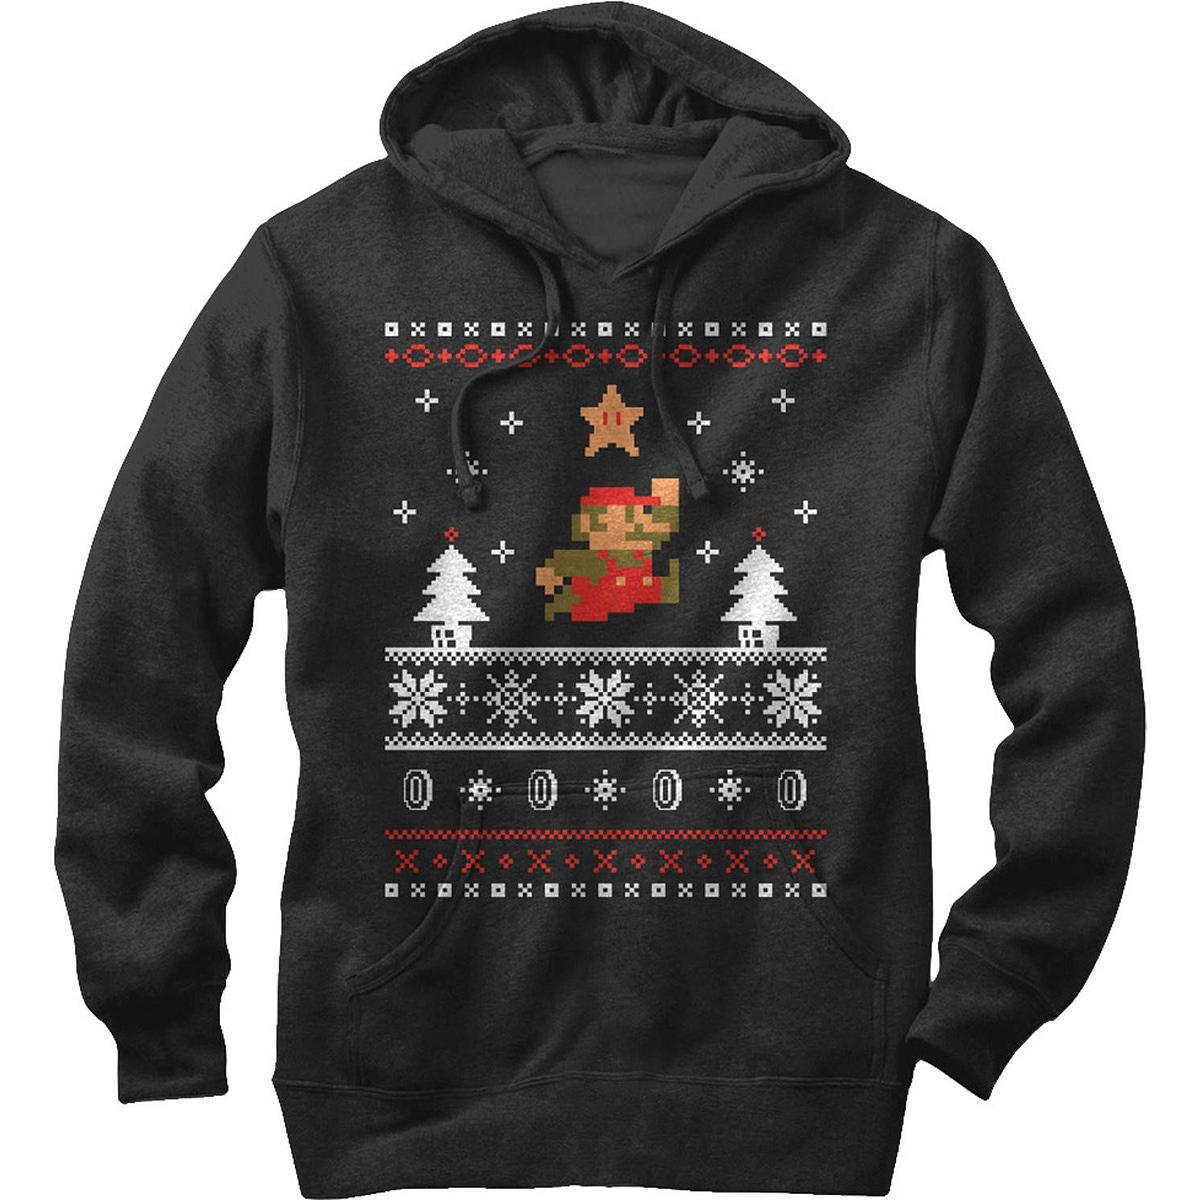 Nintendo Super Mario Faux Christmas Sweater - Hoodie - PopCult Wear